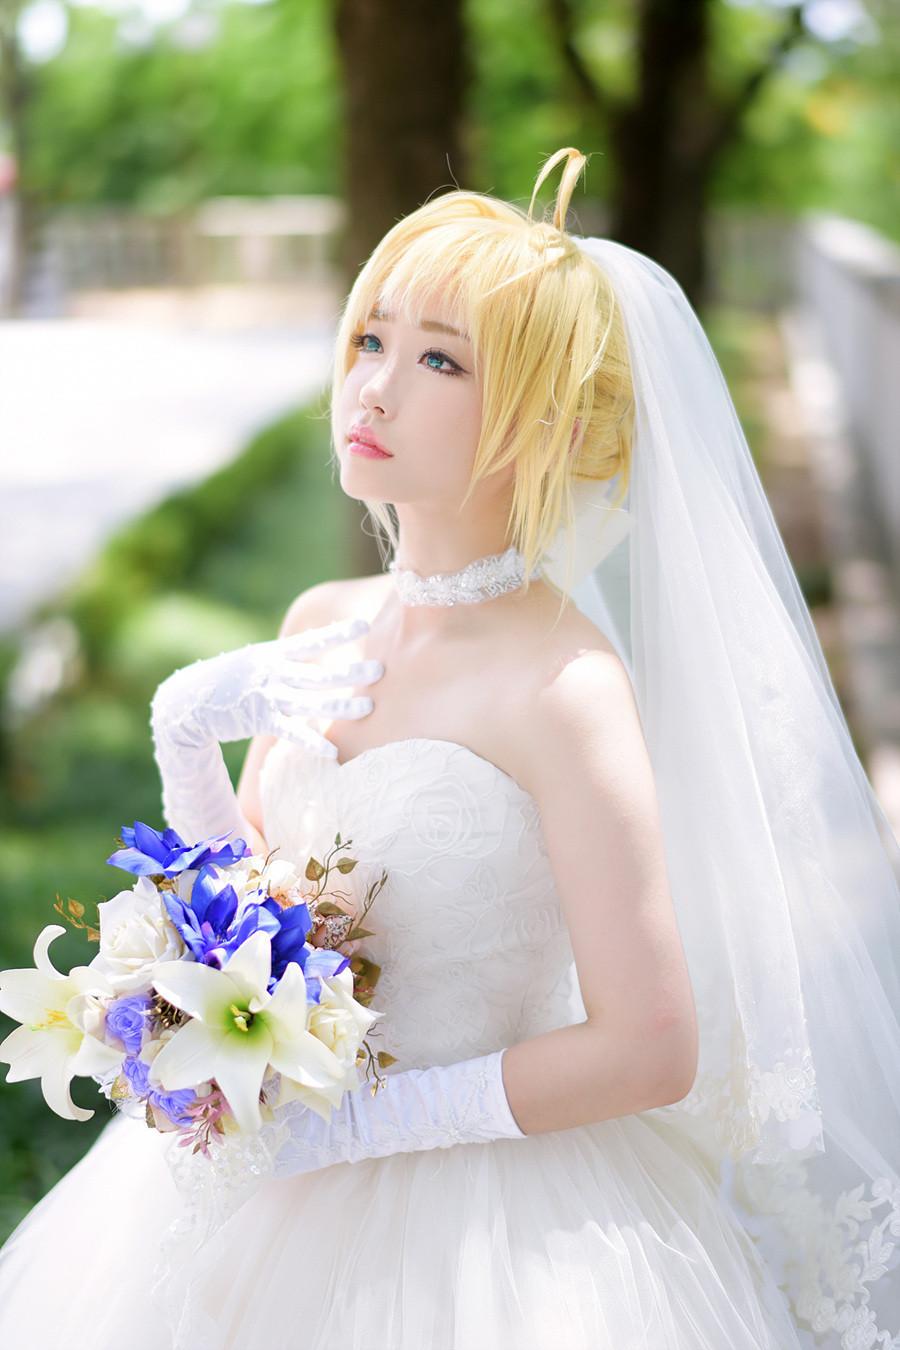 婚纱cos_雏田黑色婚纱cos